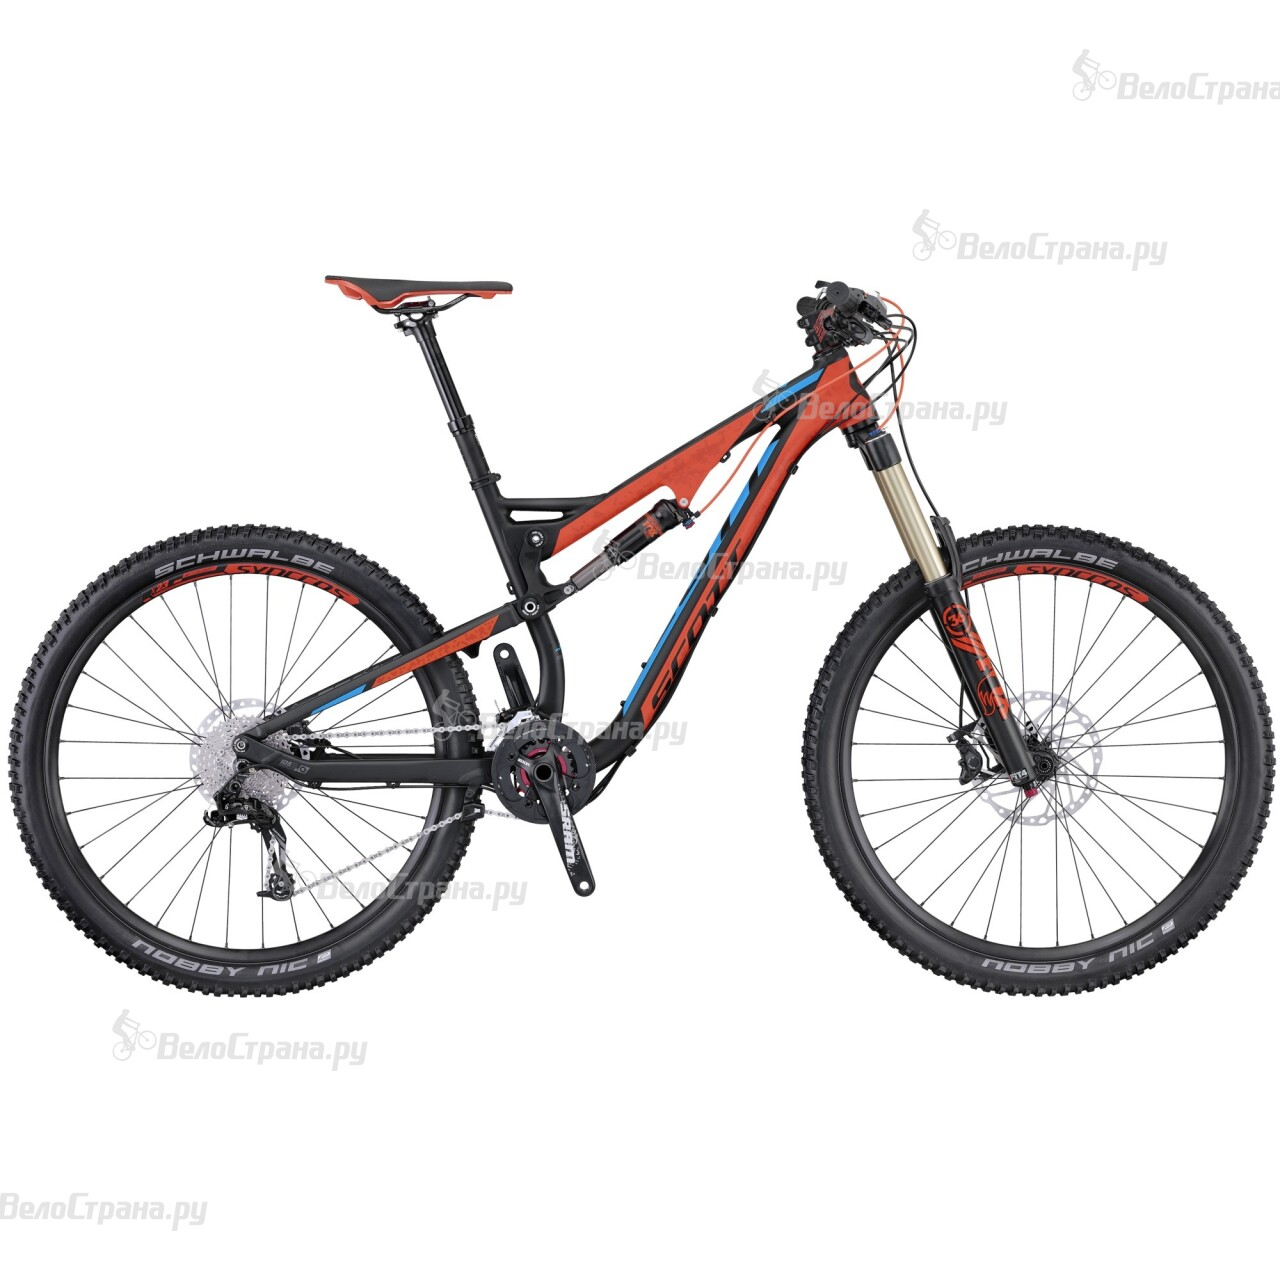 Велосипед Scott Genius LT 720 (2016) велосипед scott genius lt 700 tuned plus 2016